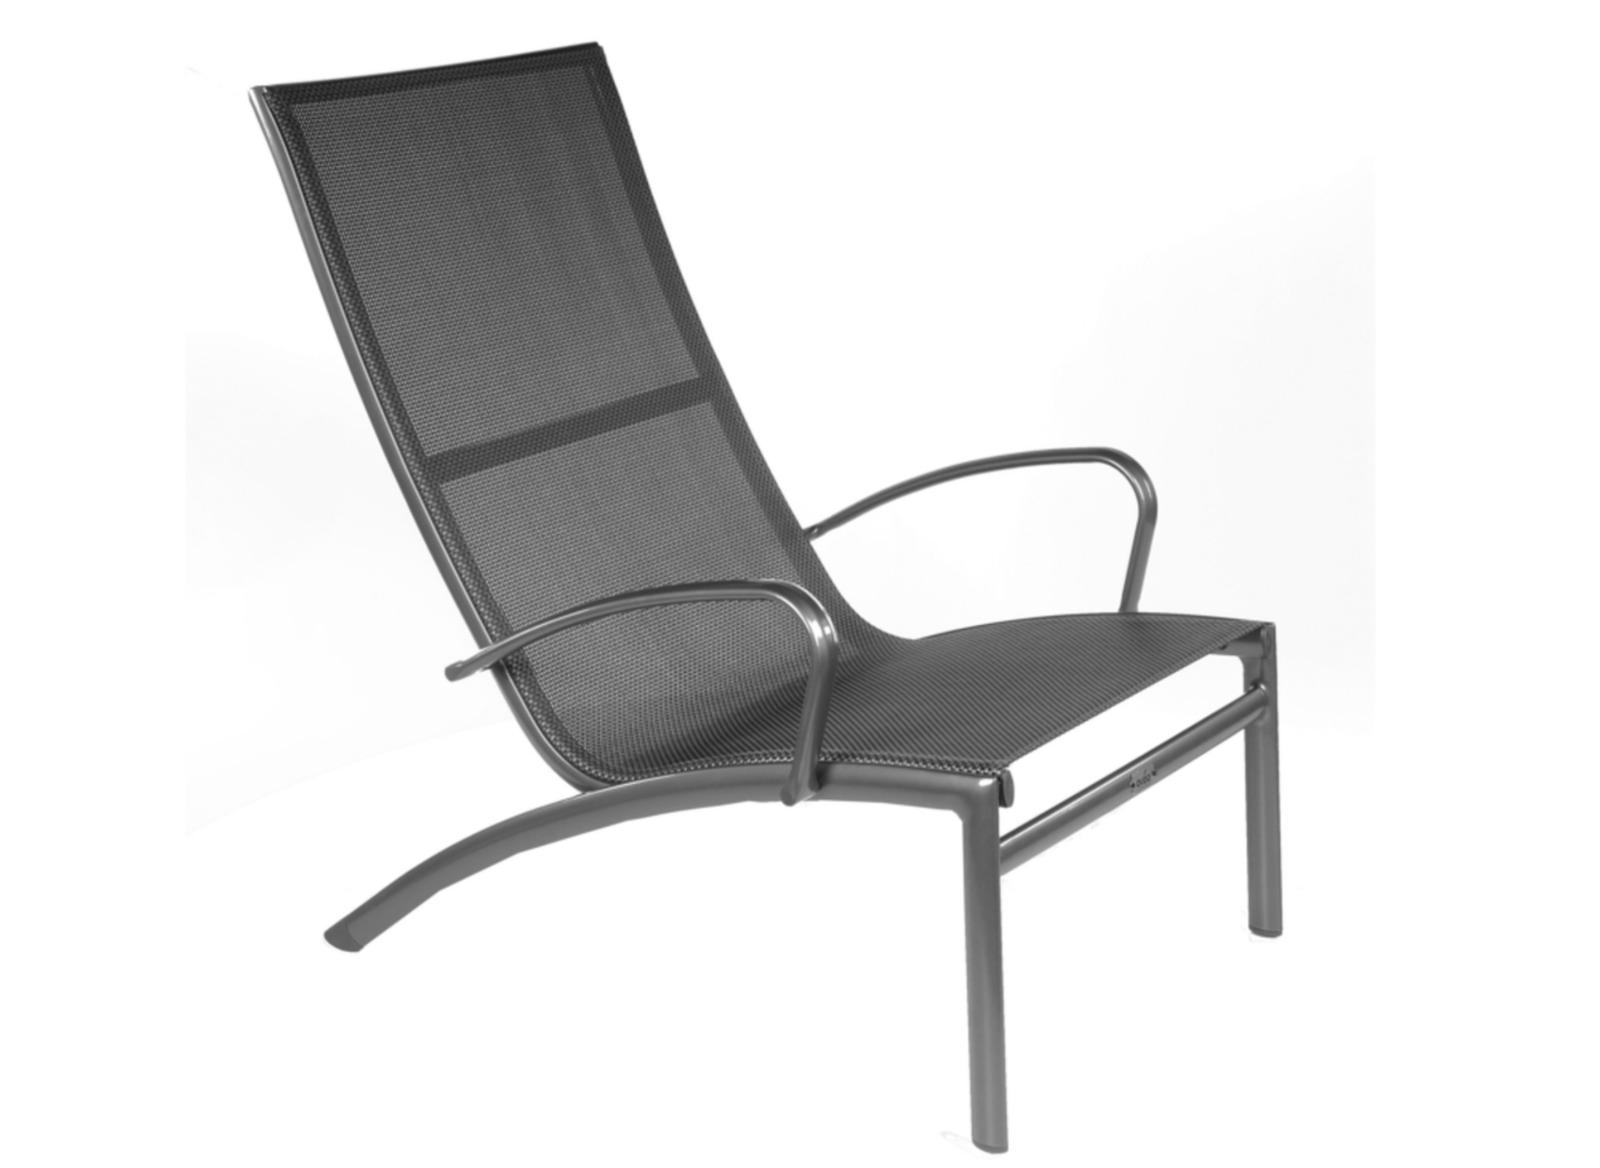 chaise de jardin oceo : azontreasures.com